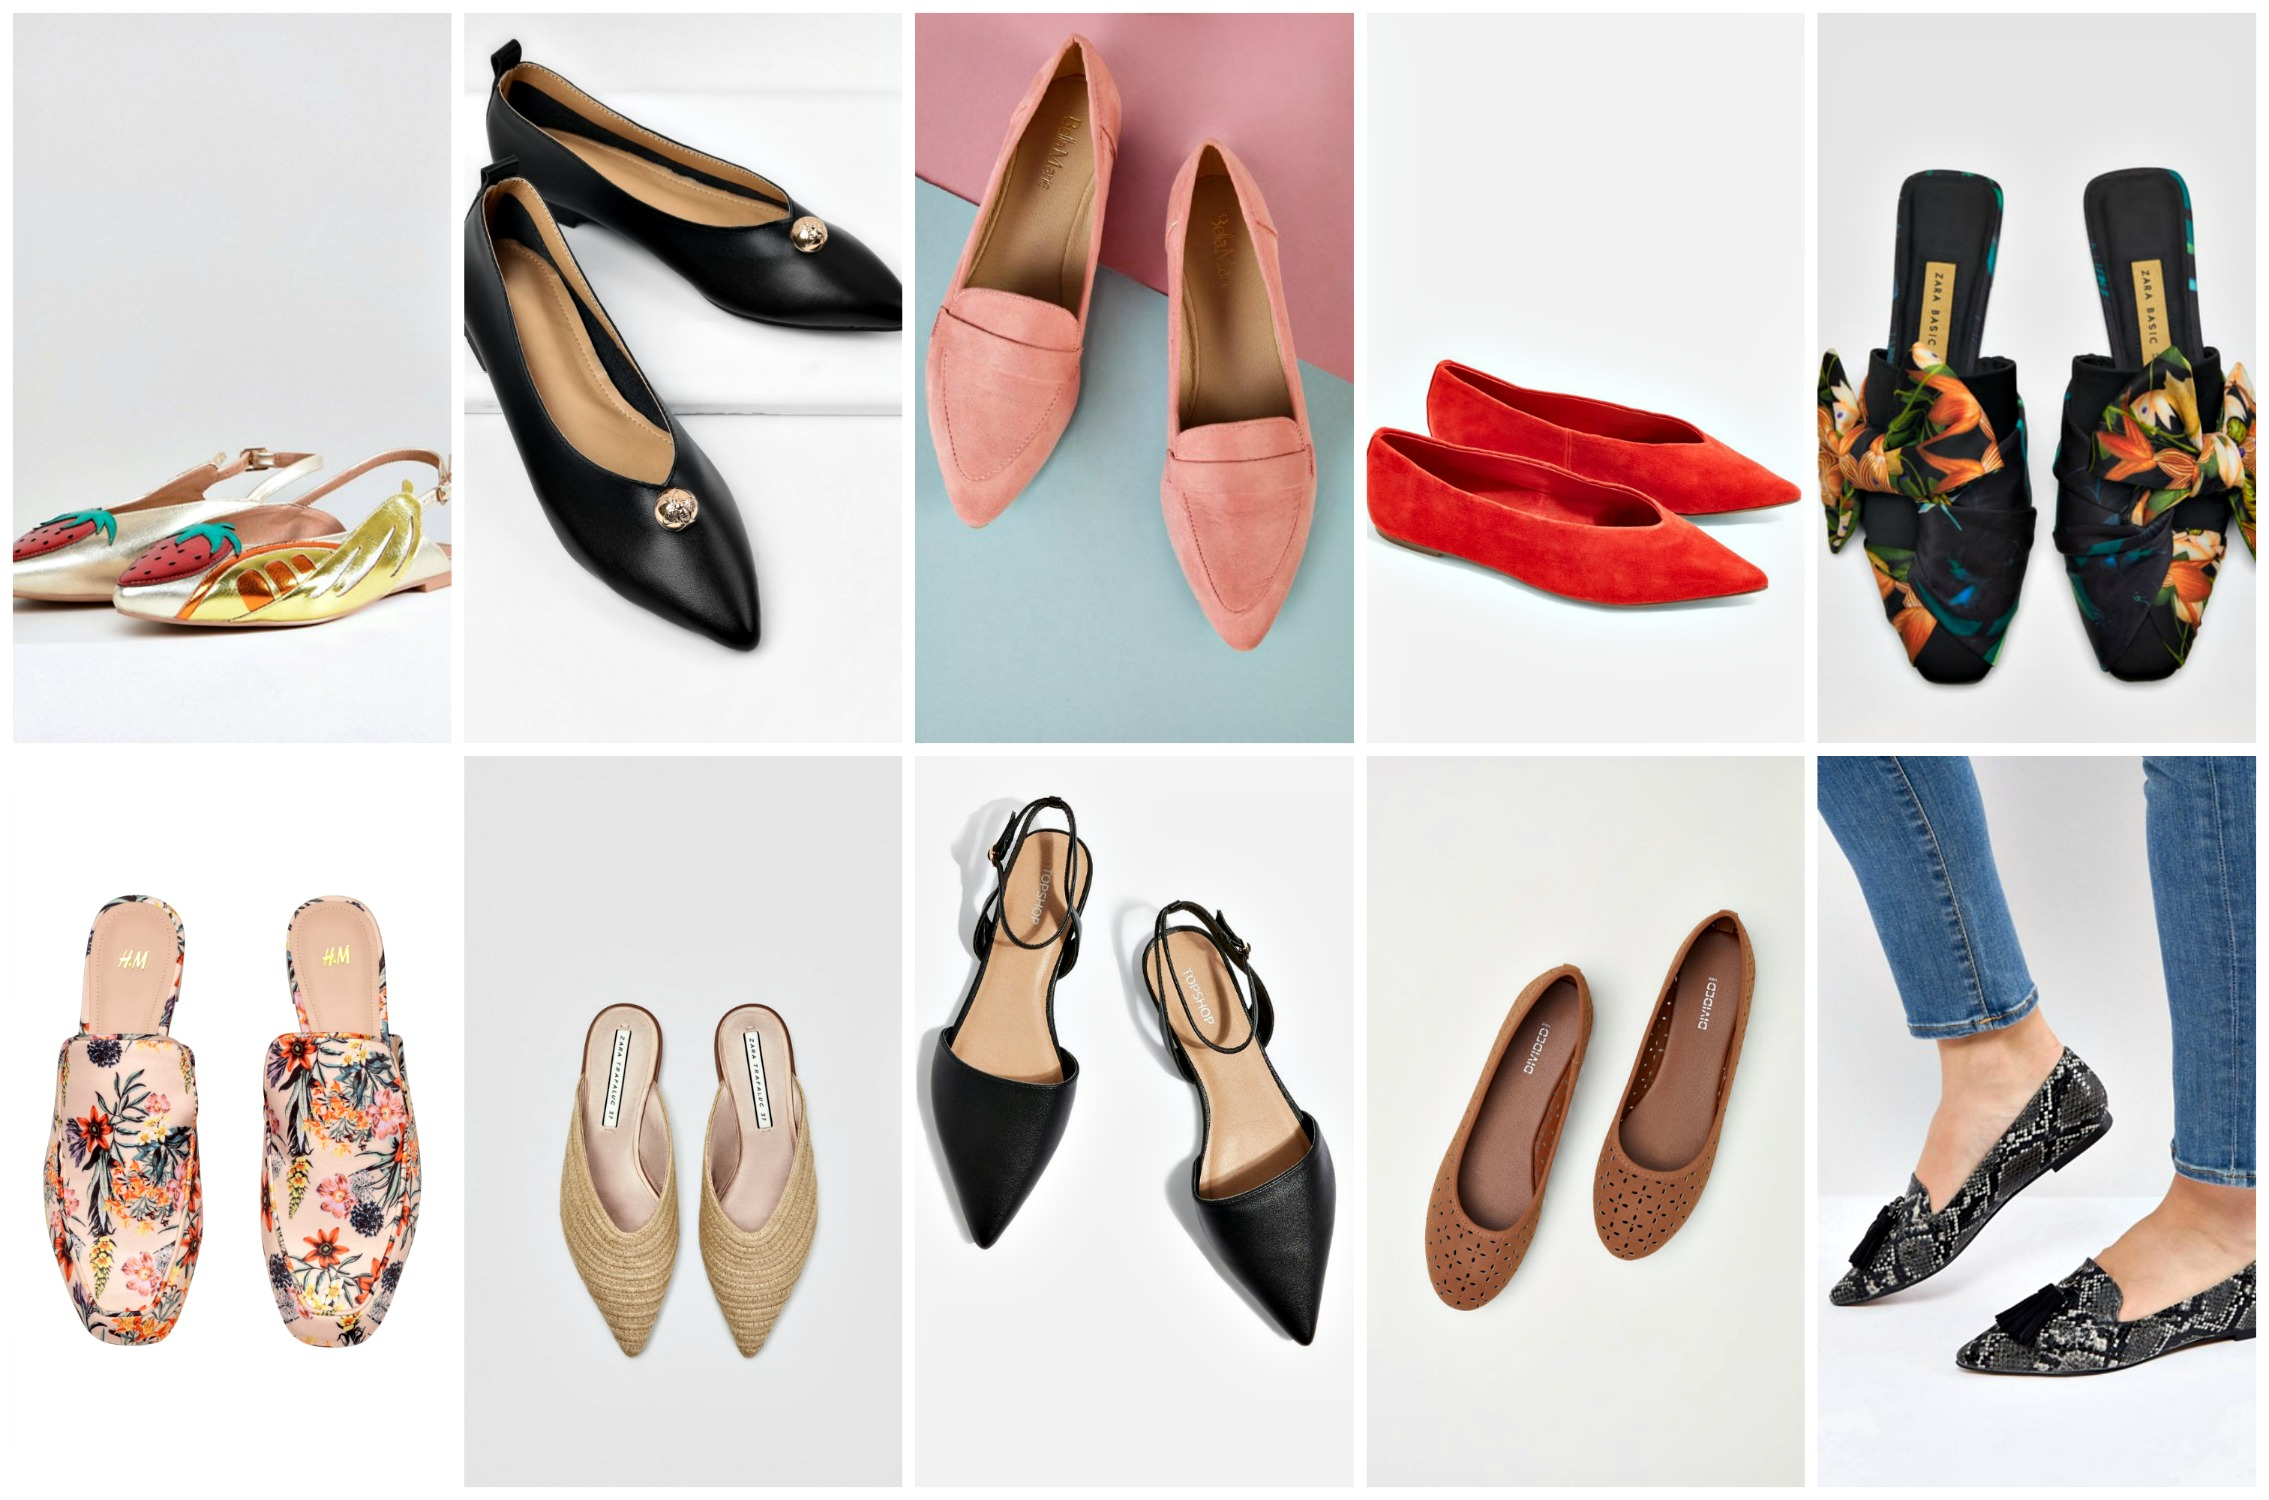 From left to right:  ASOS LIME Wide Fit Sling Back Ballet Flats , $40;  SHEIN Pointed Toe High Vamp PU Flats , $24;  SHEIN Faux Suede Pointy Toe Flat , $19;  TopShop Soft Ballerina Pumps , $48;  Zara Floral Mules ; $45.90;  H & M Slip-On Loafers , $24.99;  Zara Braided Mules , $49.90;  TopShop Pointed Shoes , $32;  H & M Ballet , $17.99;  ASOS Laurel Ballet Flats  $29